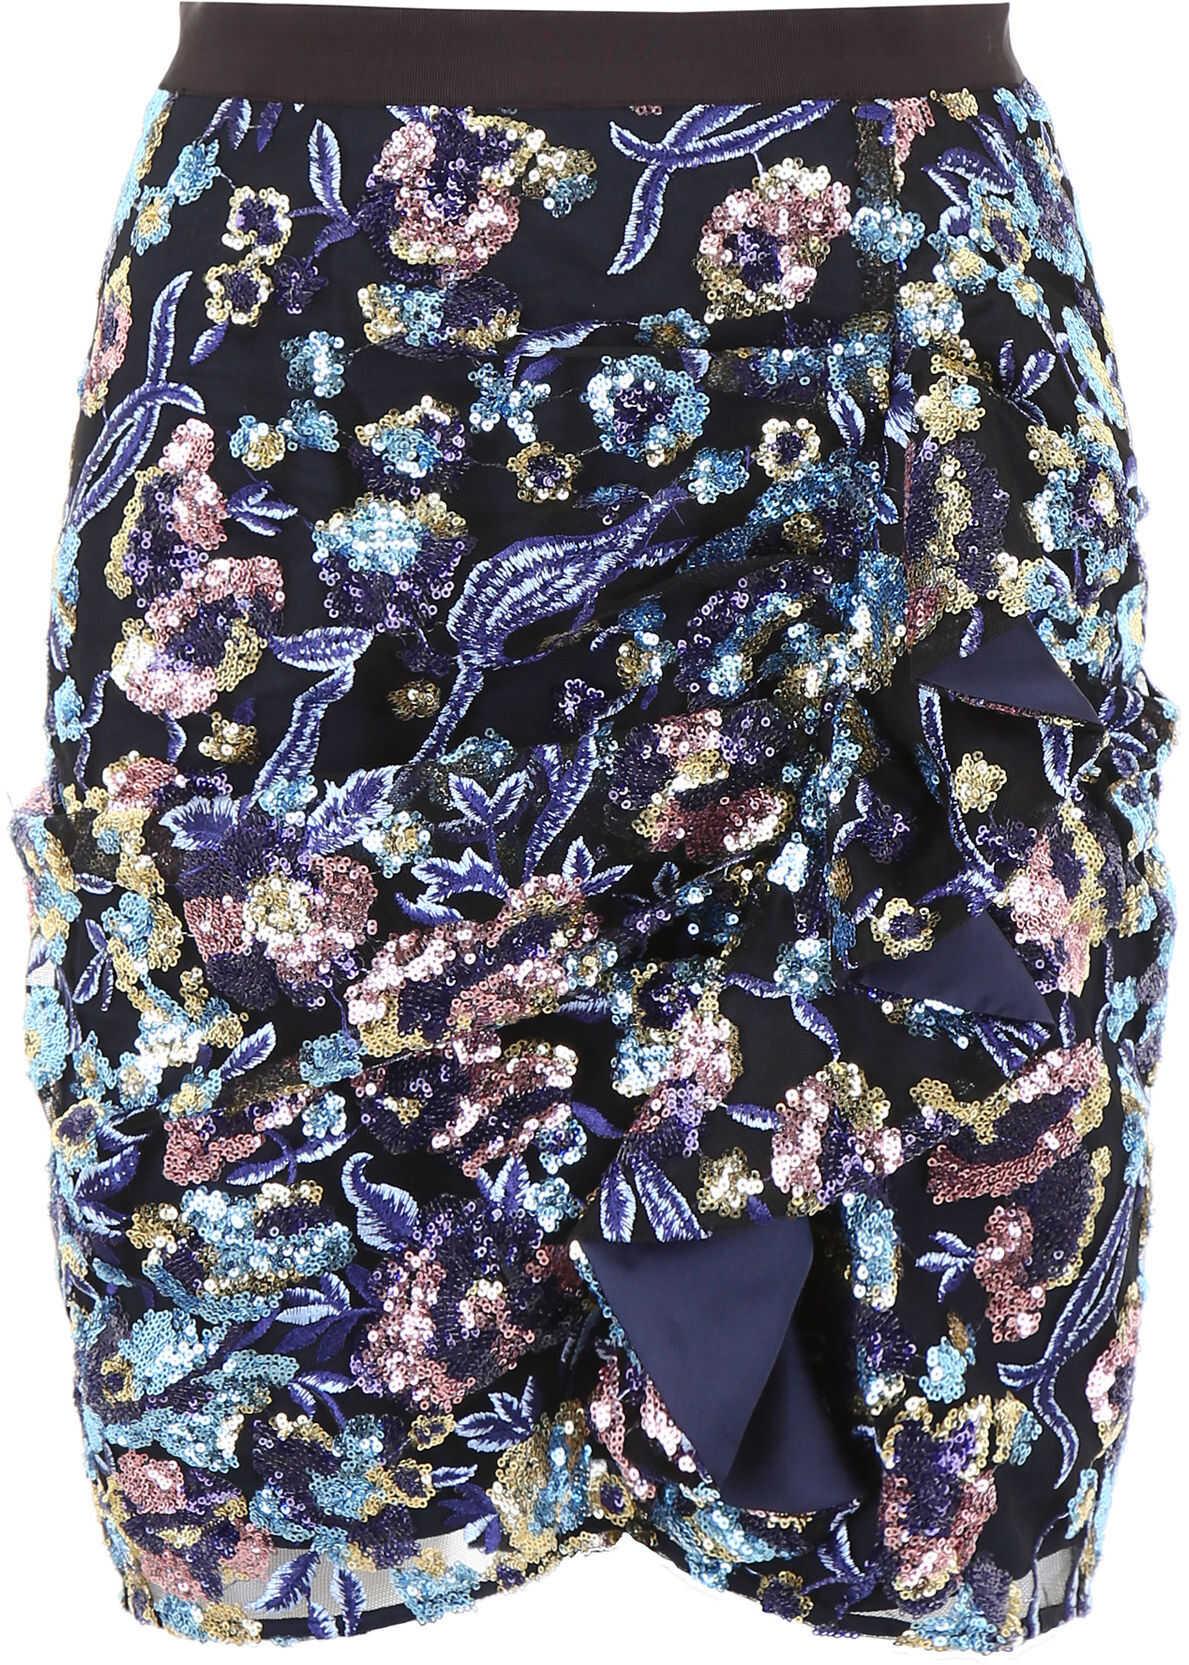 Self-Portrait Mini Skirt With Sequins* MULTI